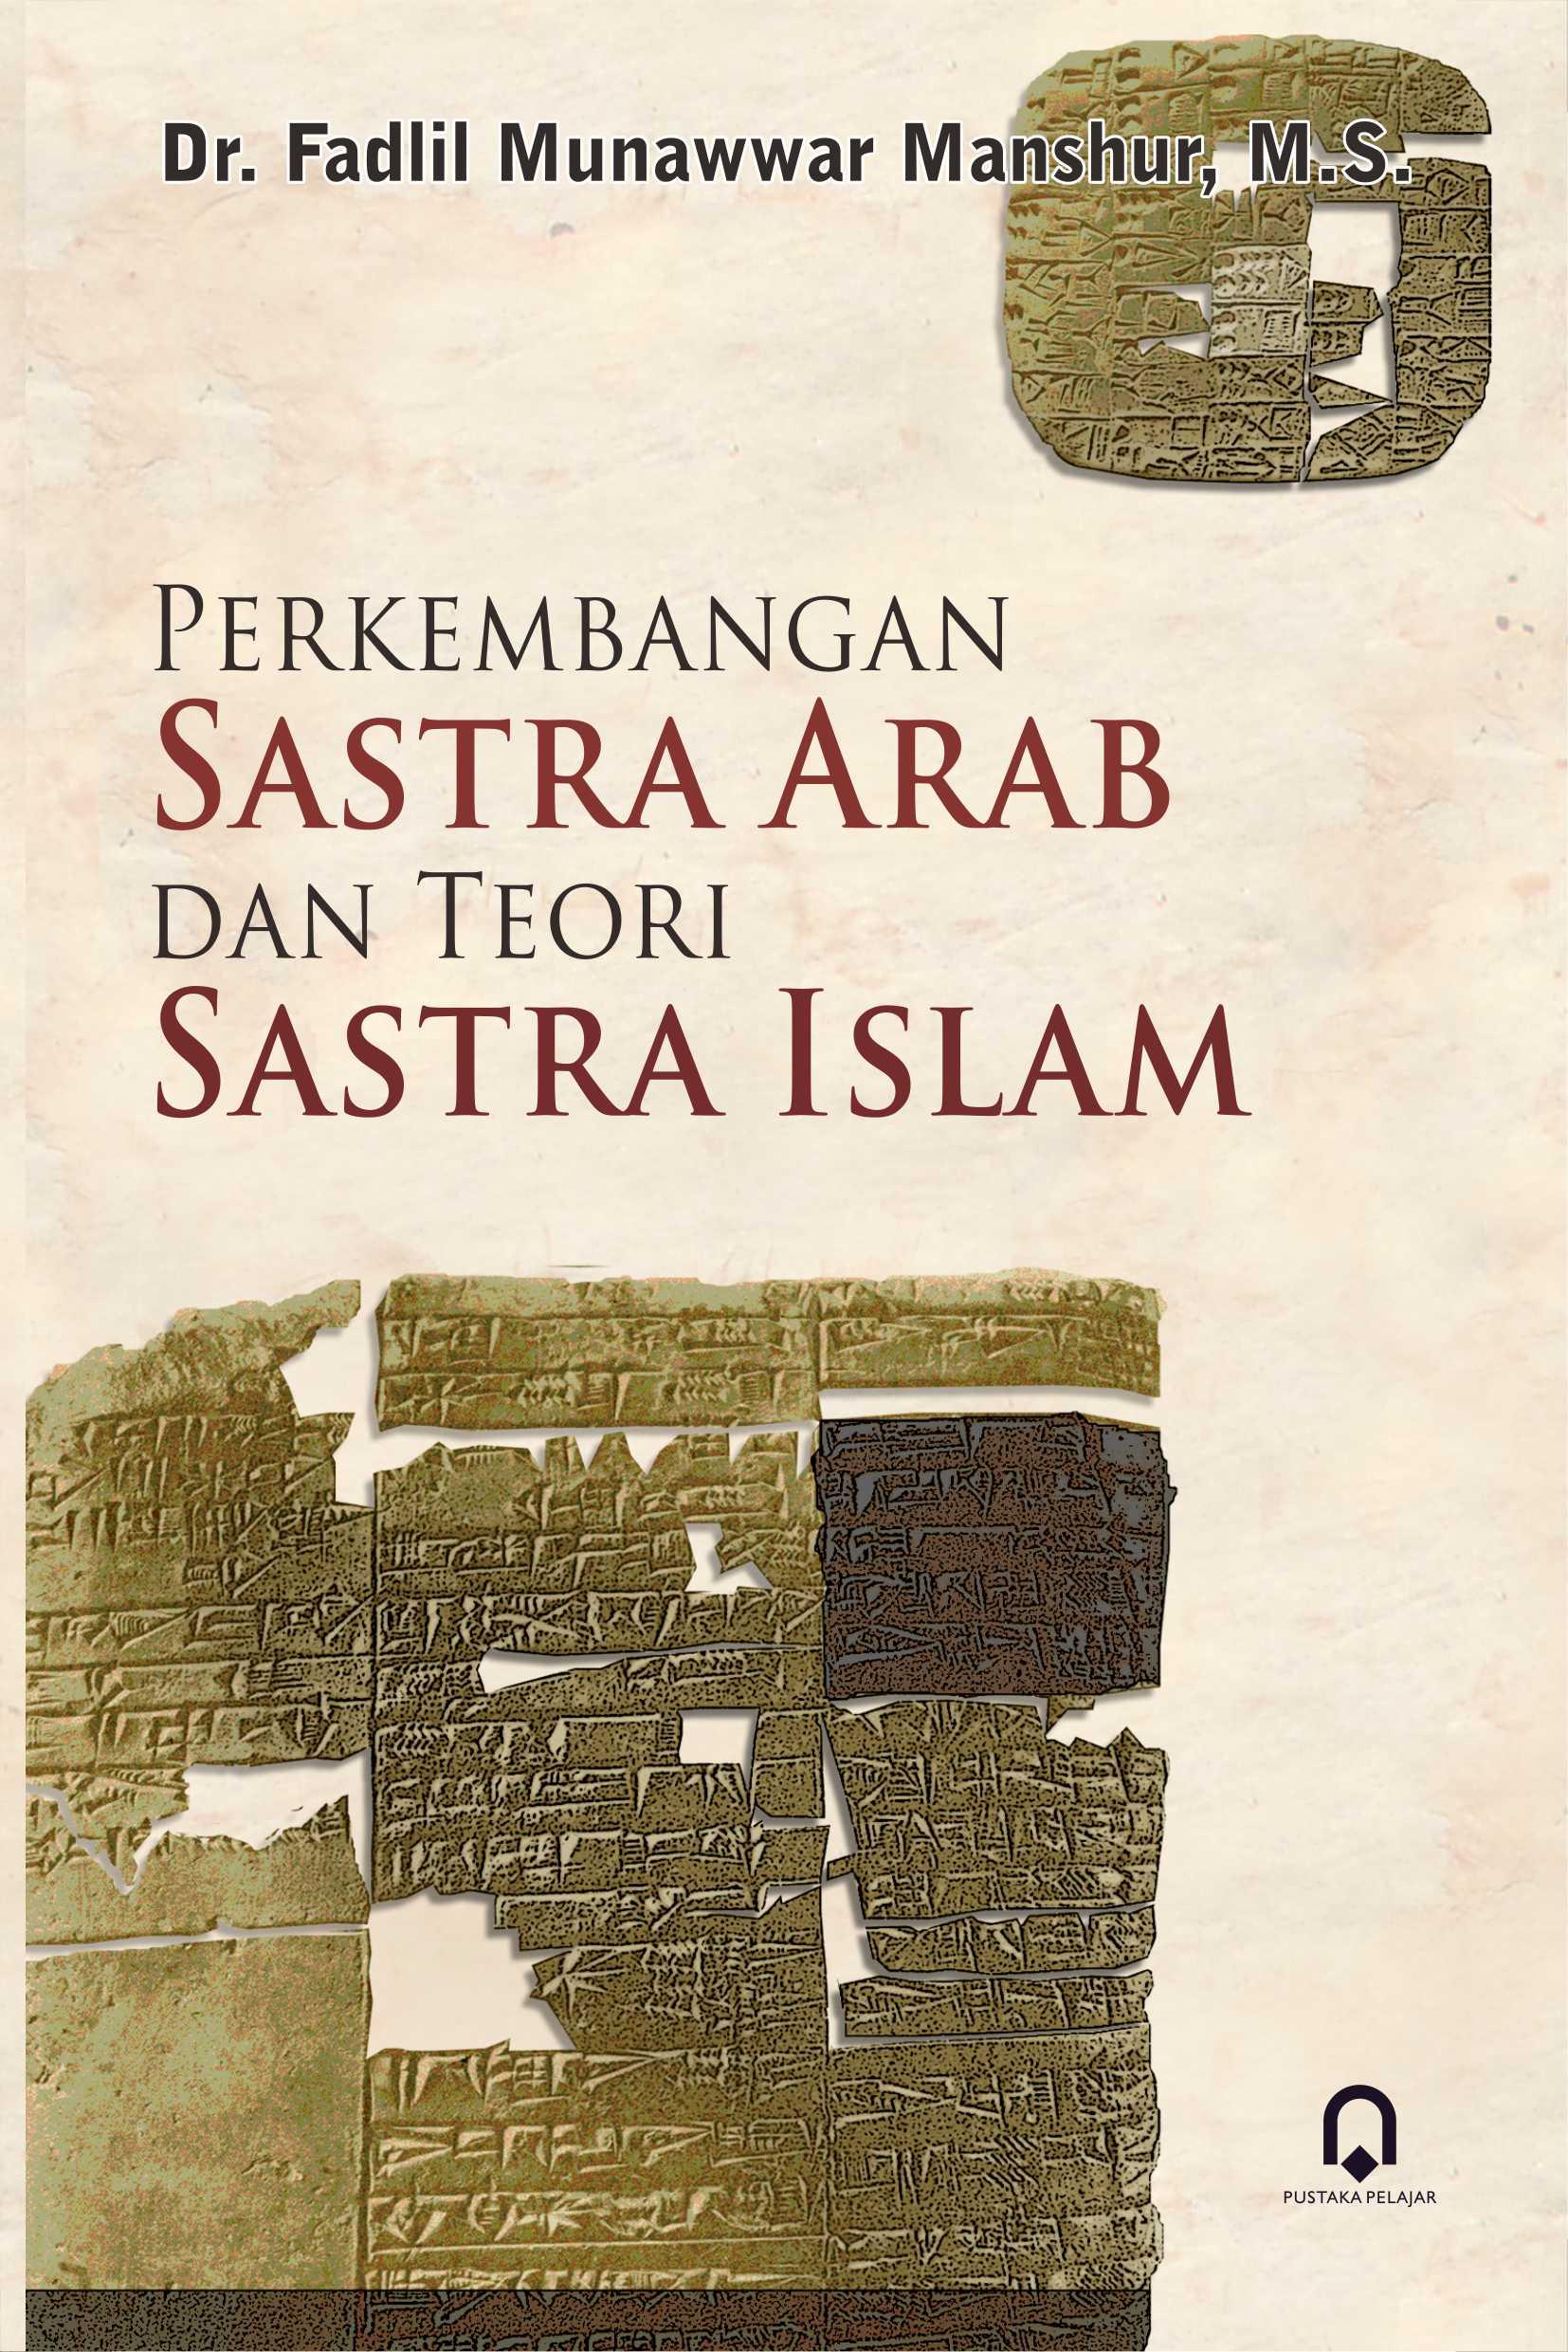 Perkembangan Sastra Arab dan Teori Sastra Islam